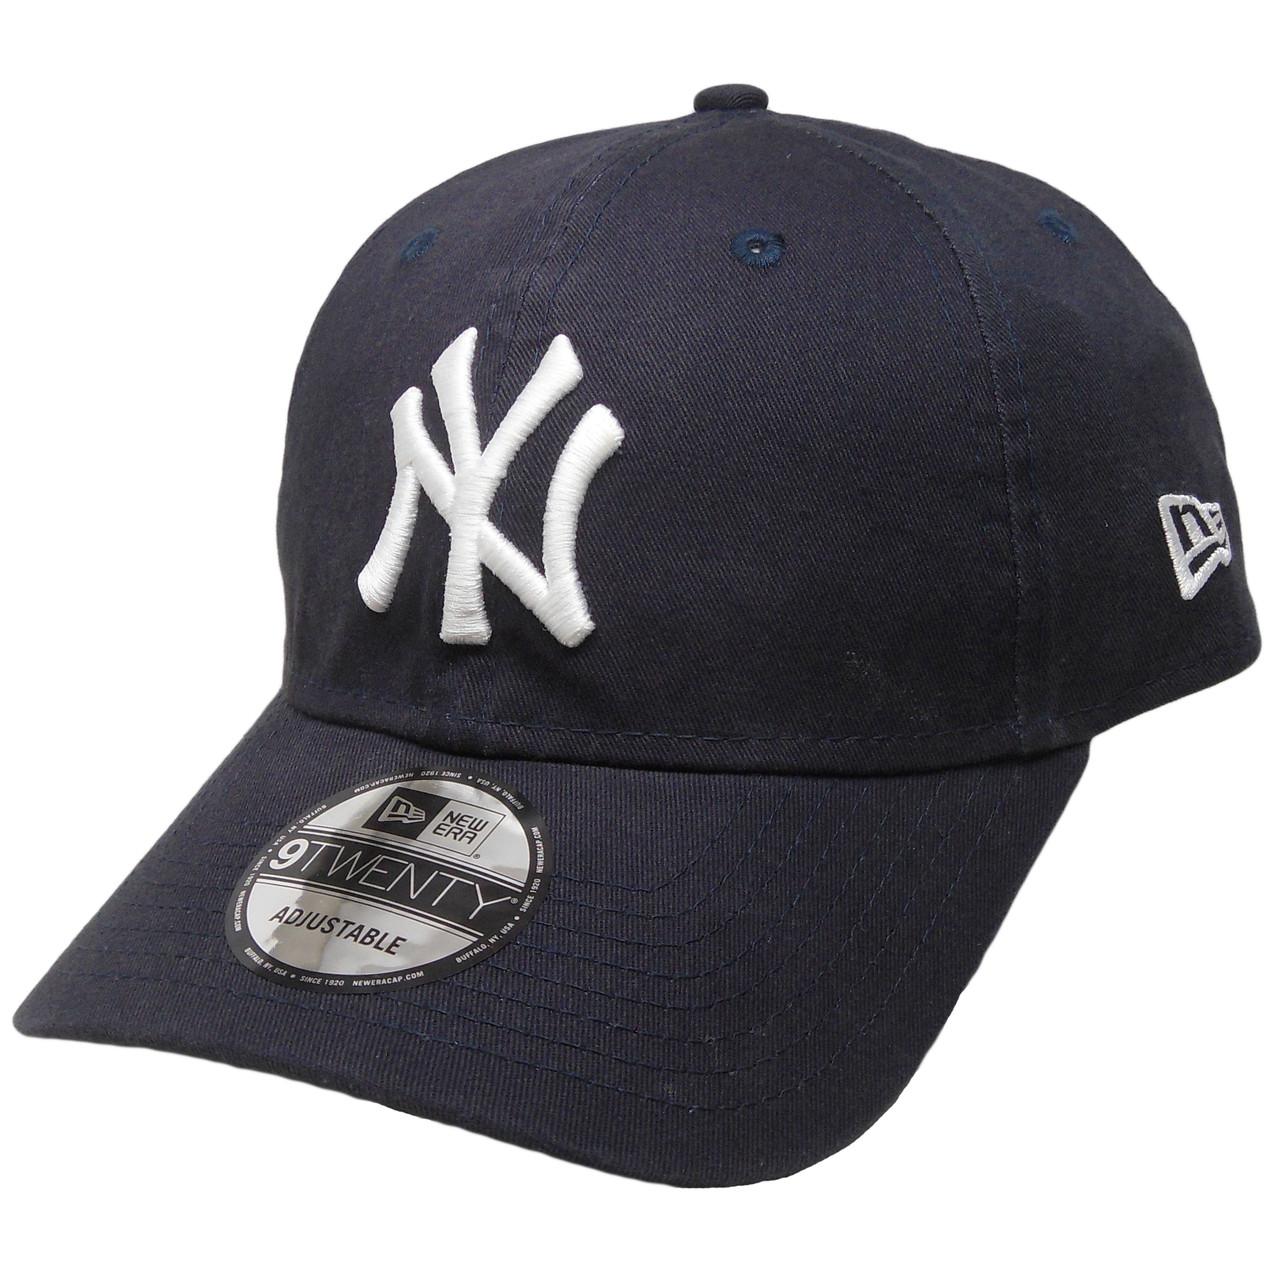 sports shoes 702b8 5e717 New York Yankees New Era Core Classic 9Twenty Adjustable Hat - Navy, White